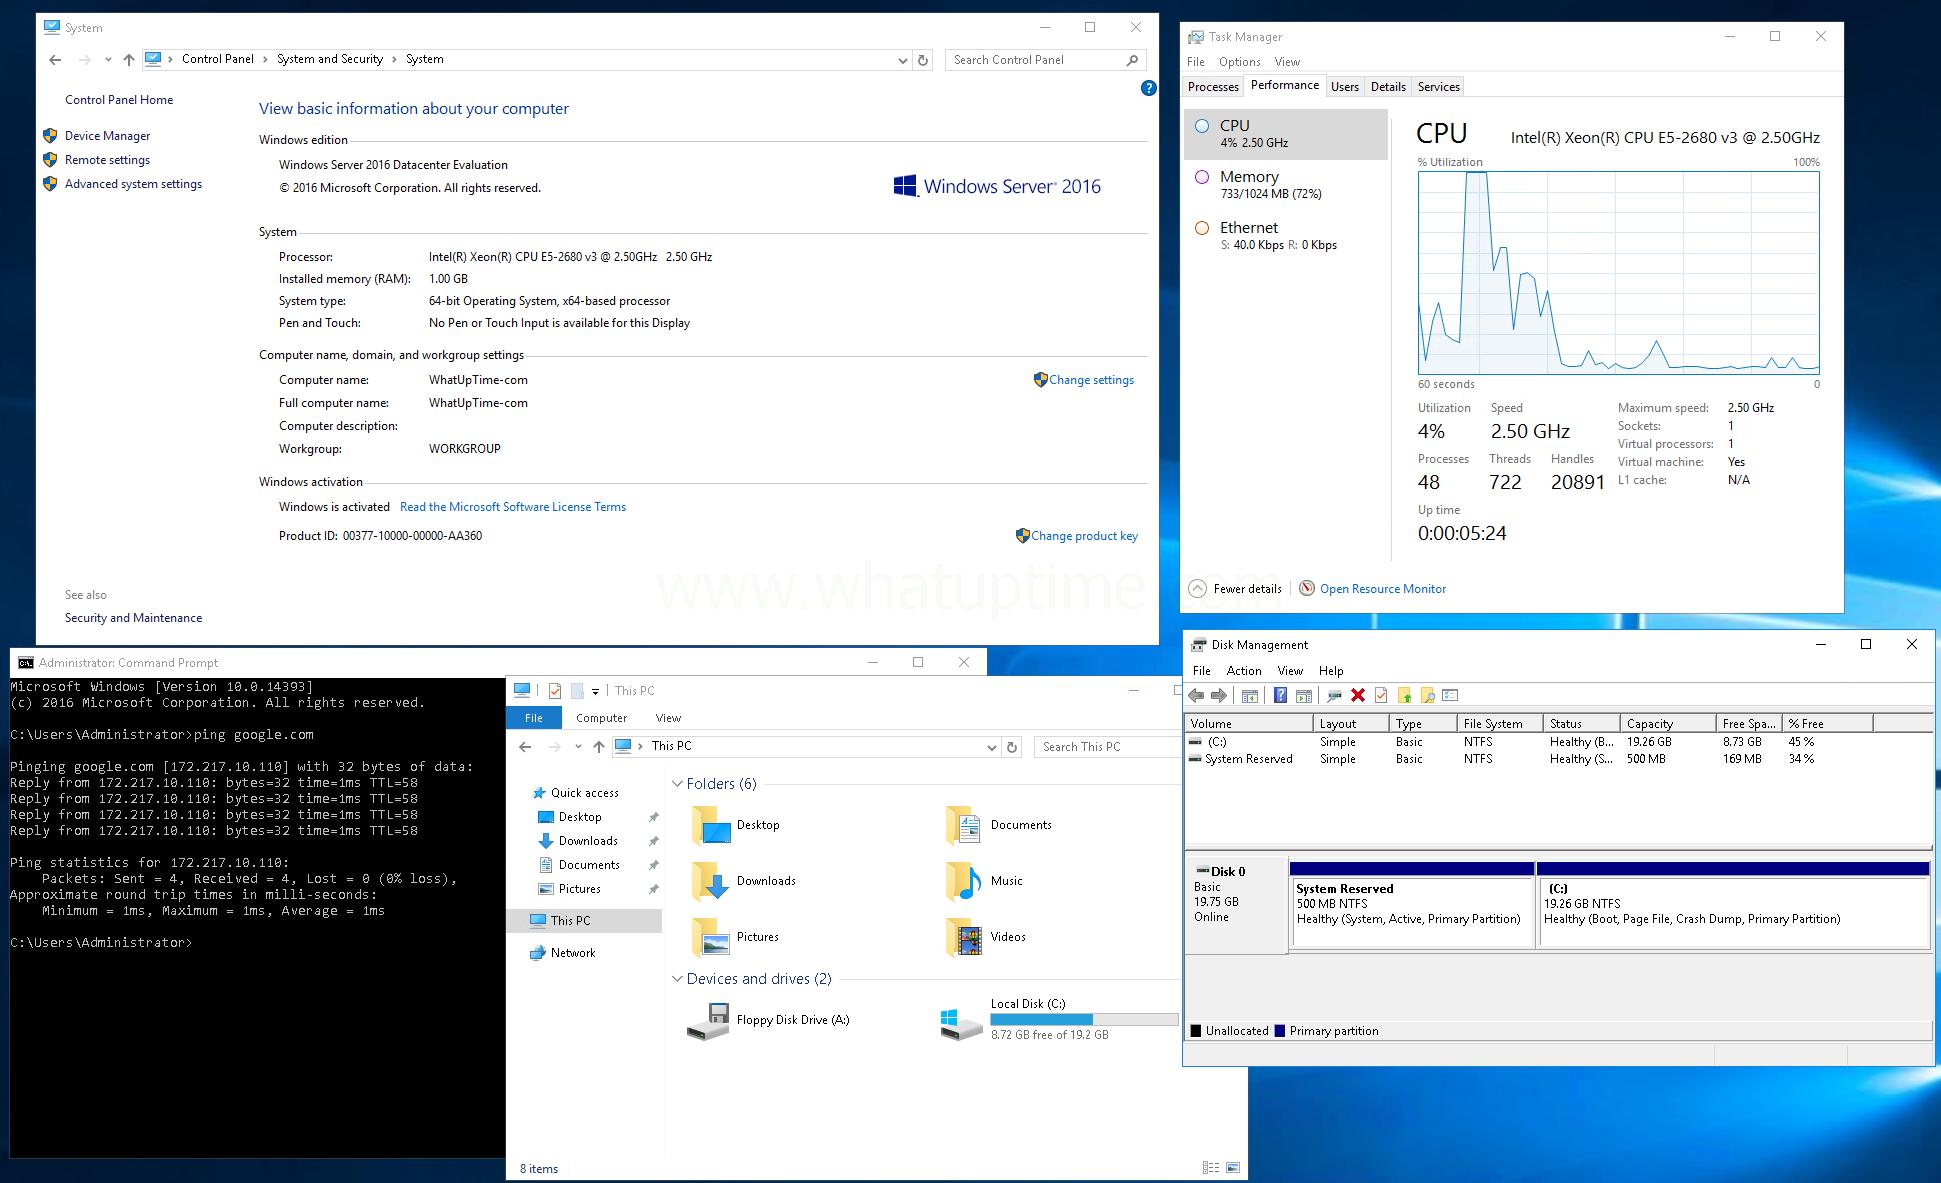 Microsoft Windows on Linode! - WhatUpTime com